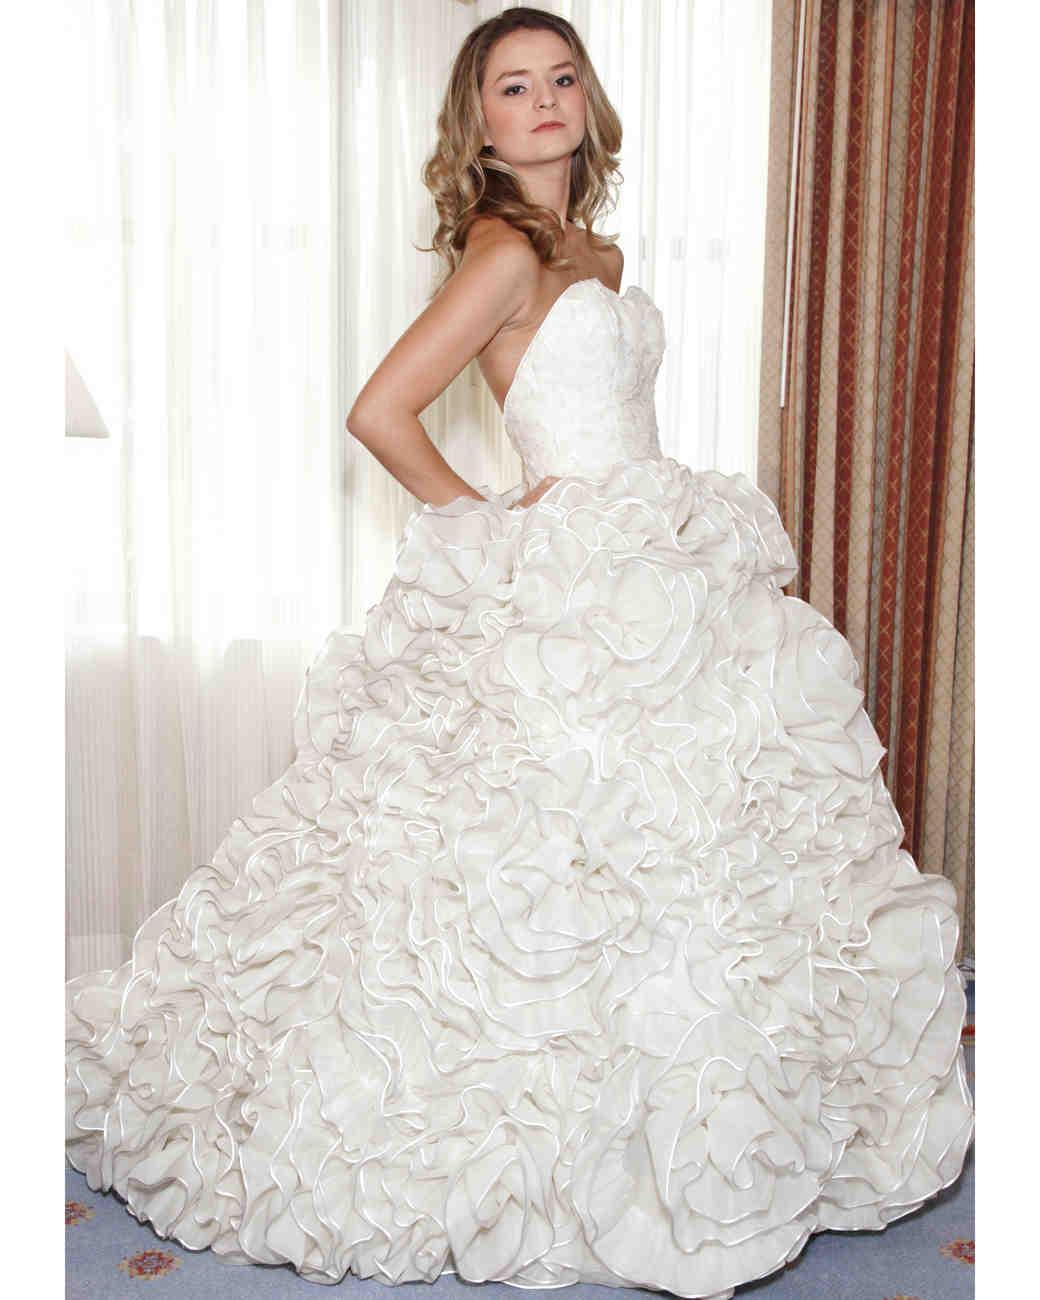 karen-hendrix-couture-fall2012-wd108109-003.jpg